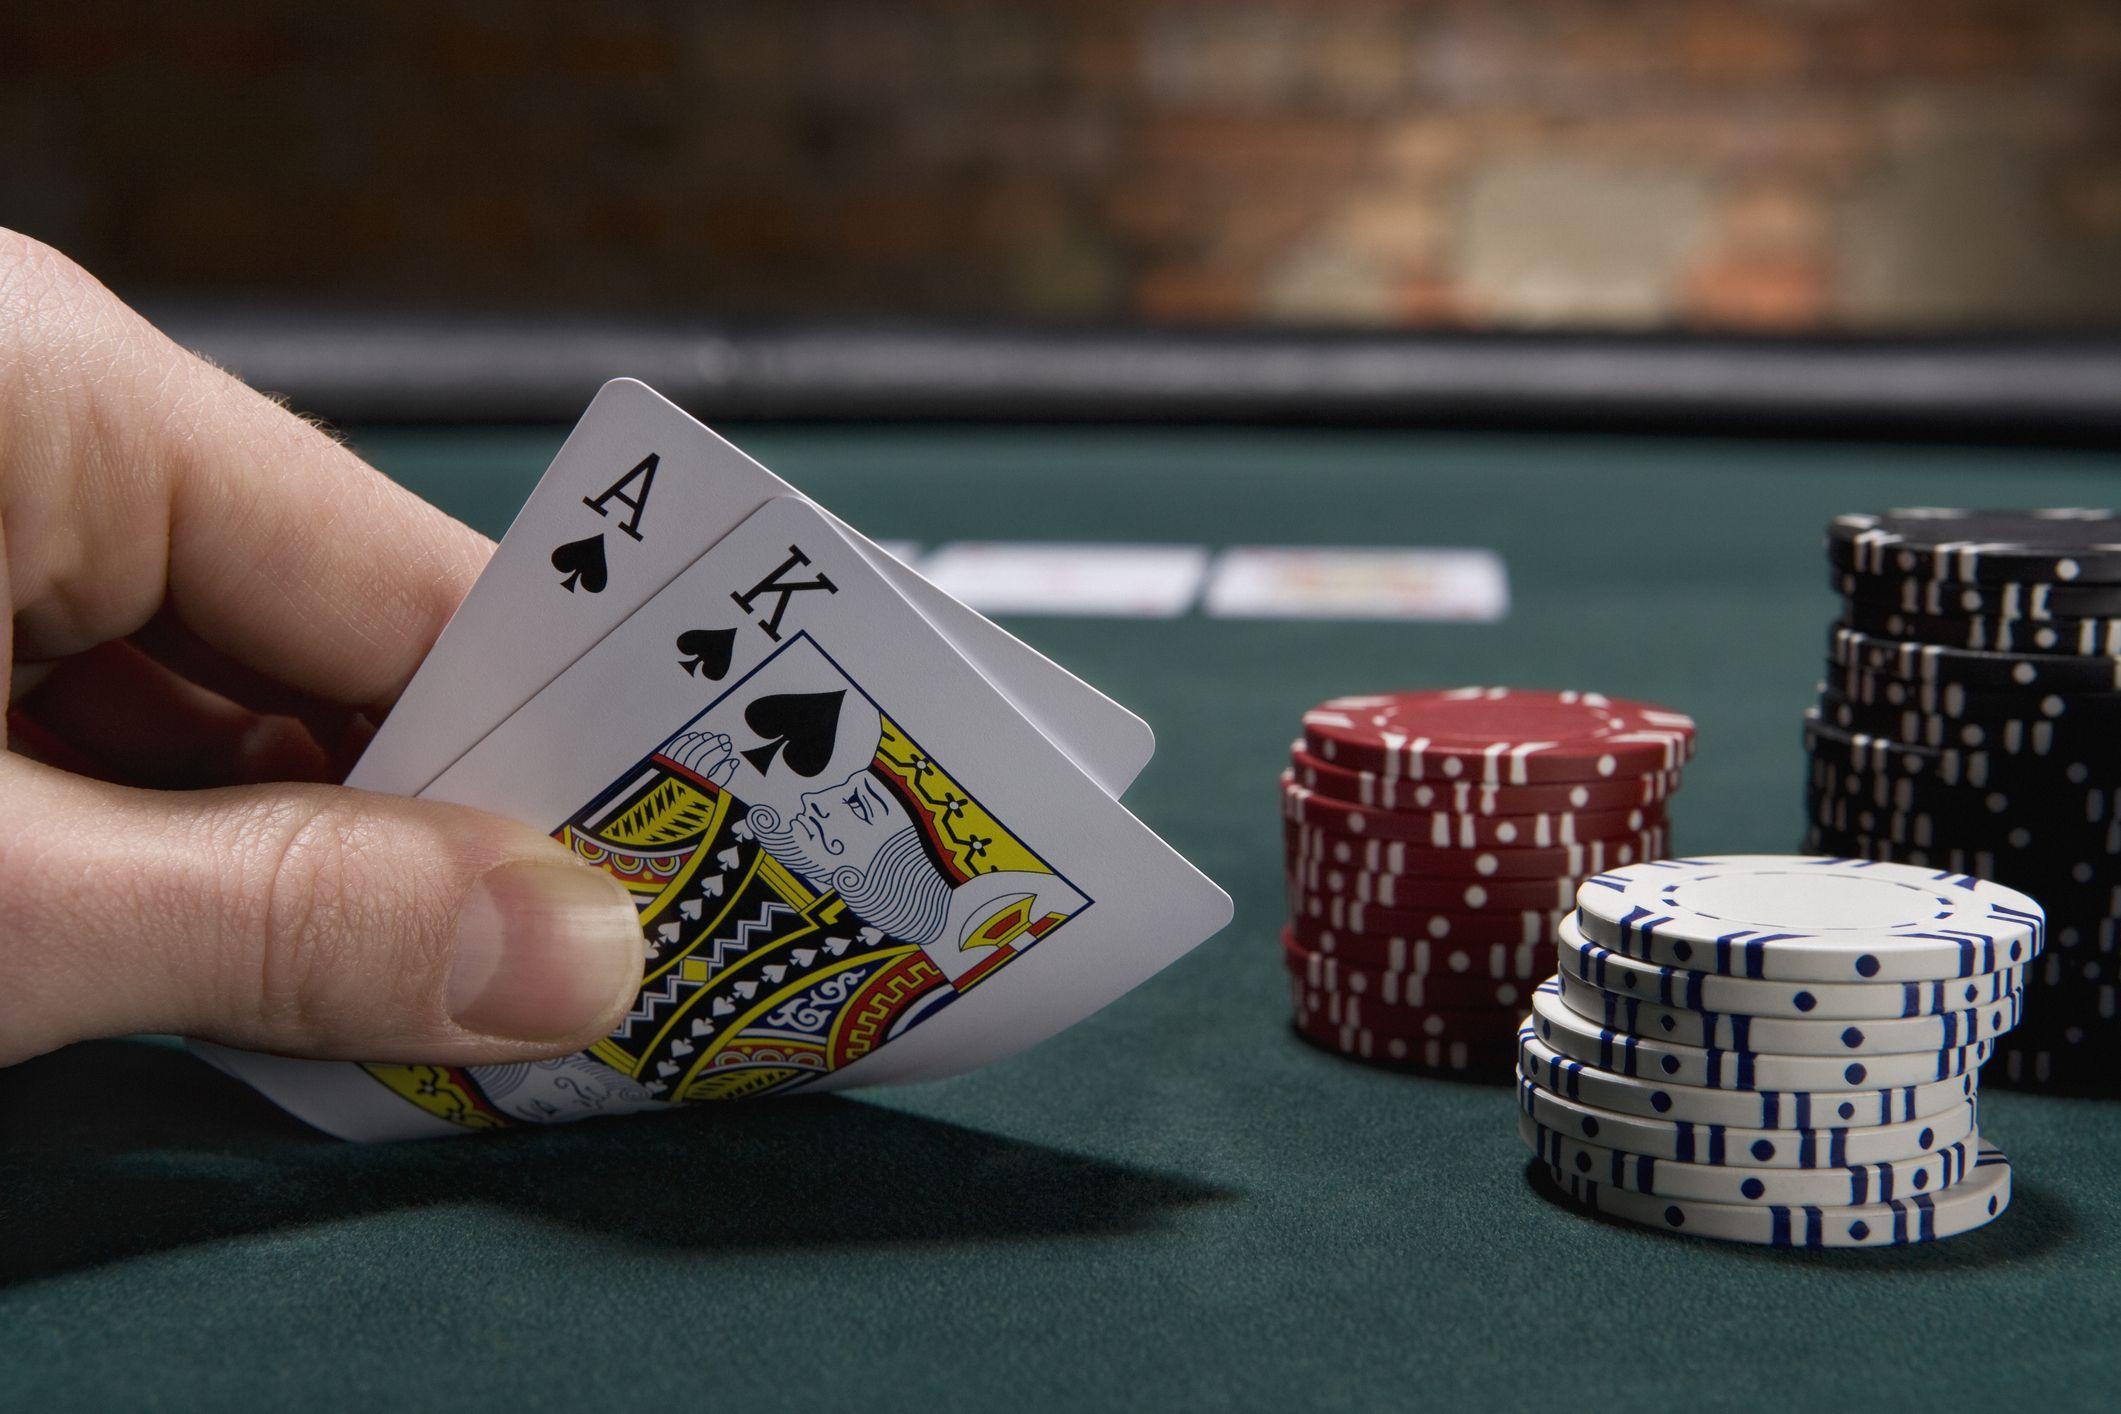 Play Smart At Casinos